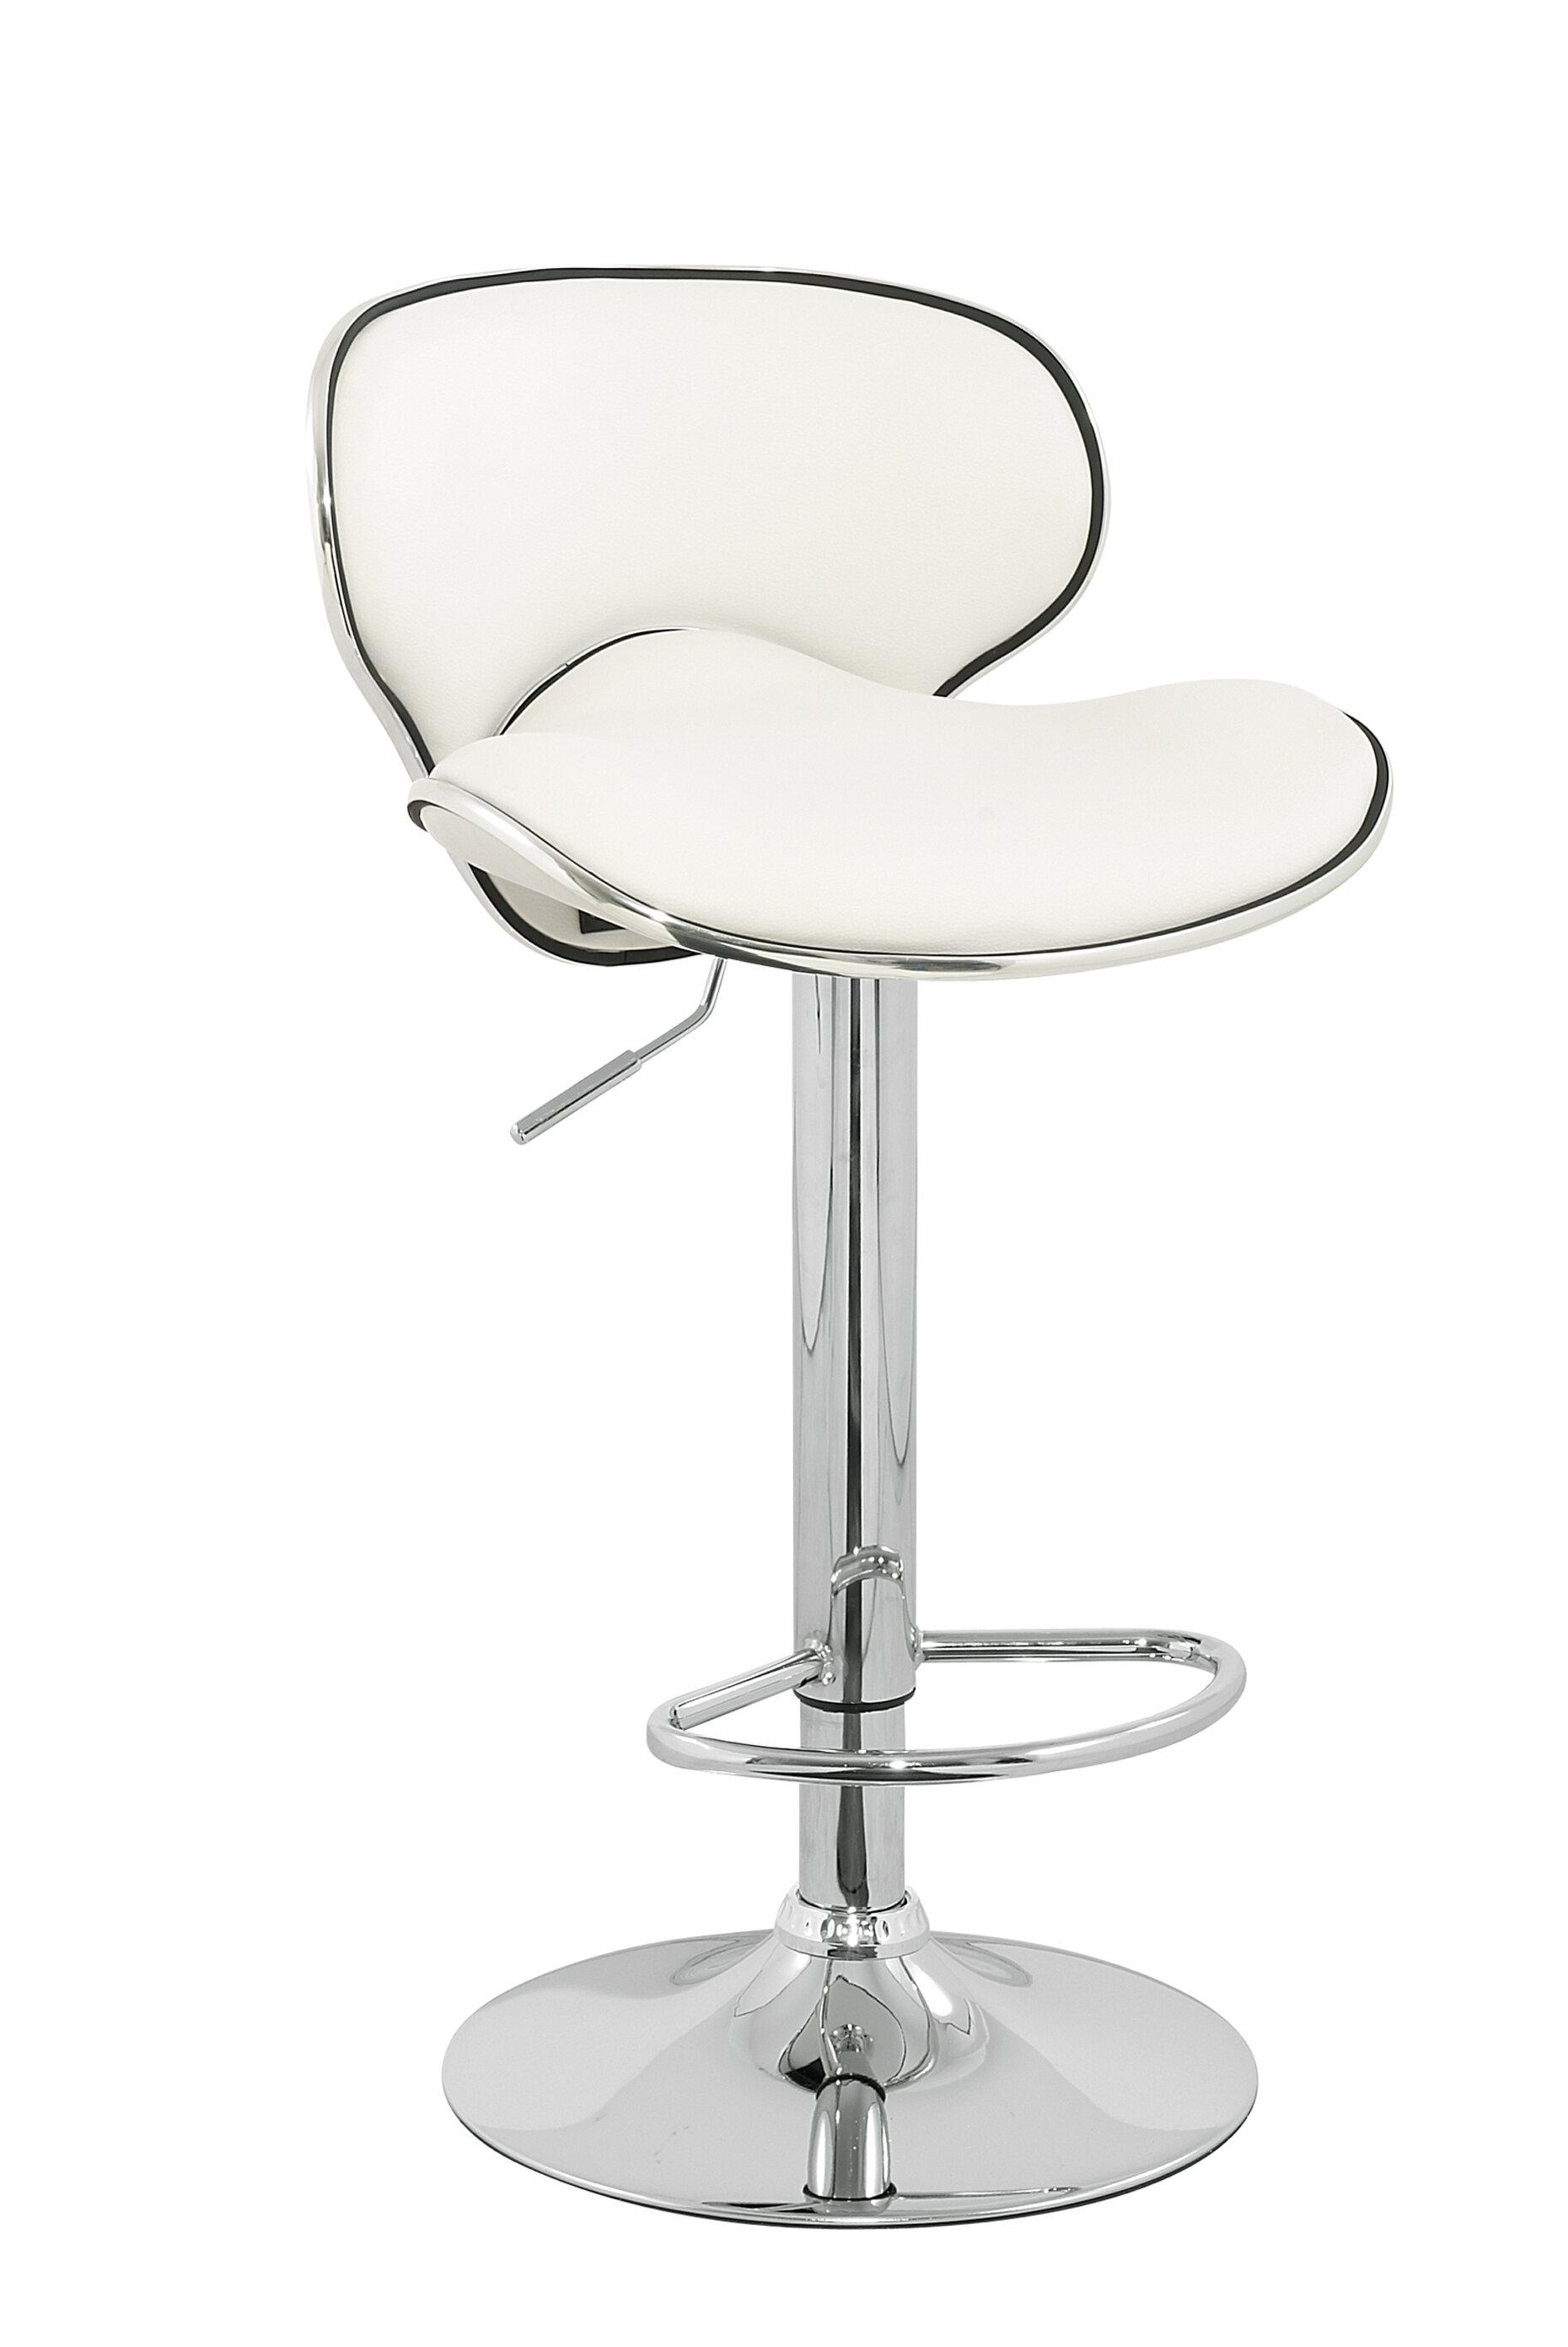 Excellent Brandon Adjustable Height Swivel Bar Stool Ibusinesslaw Wood Chair Design Ideas Ibusinesslaworg